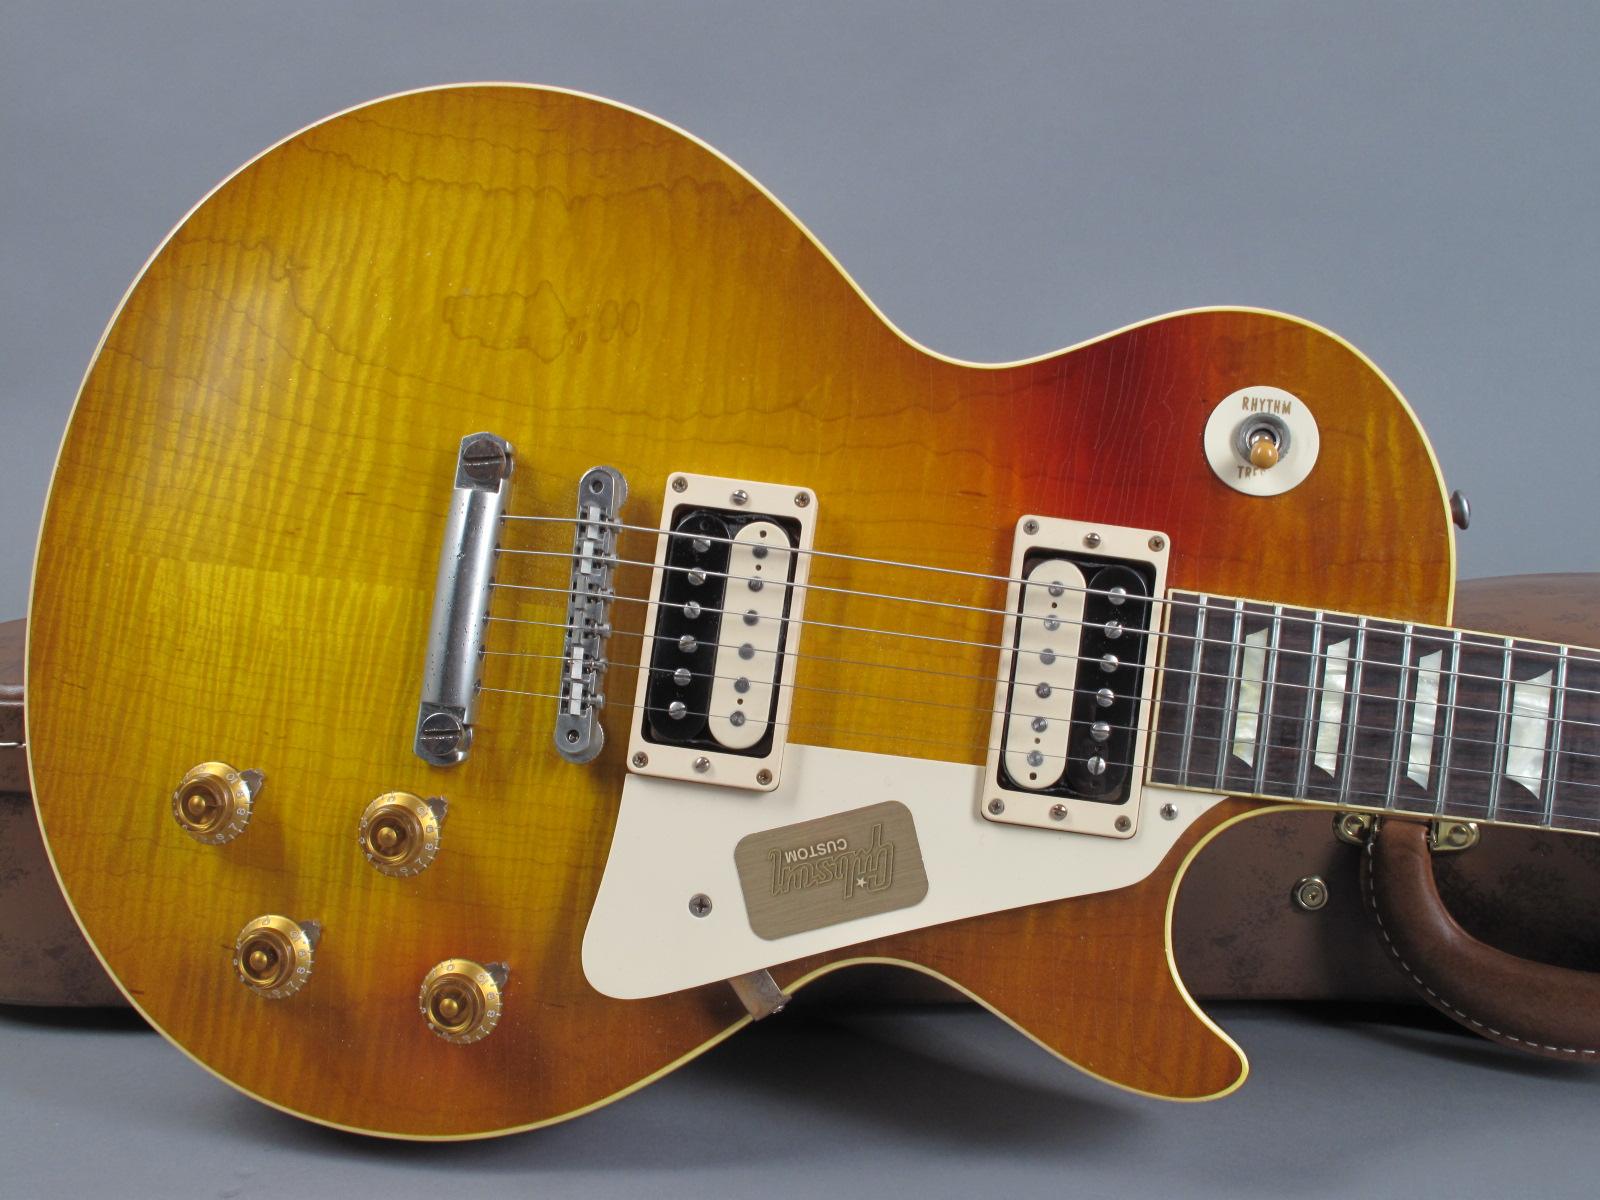 https://guitarpoint.de/app/uploads/products/2014-gibson-les-paul-1959-collectors-choice-16-ed-king-redeye-aged/2014_Gibson-Les-Paul-Redeye-CC16A172-9.jpg